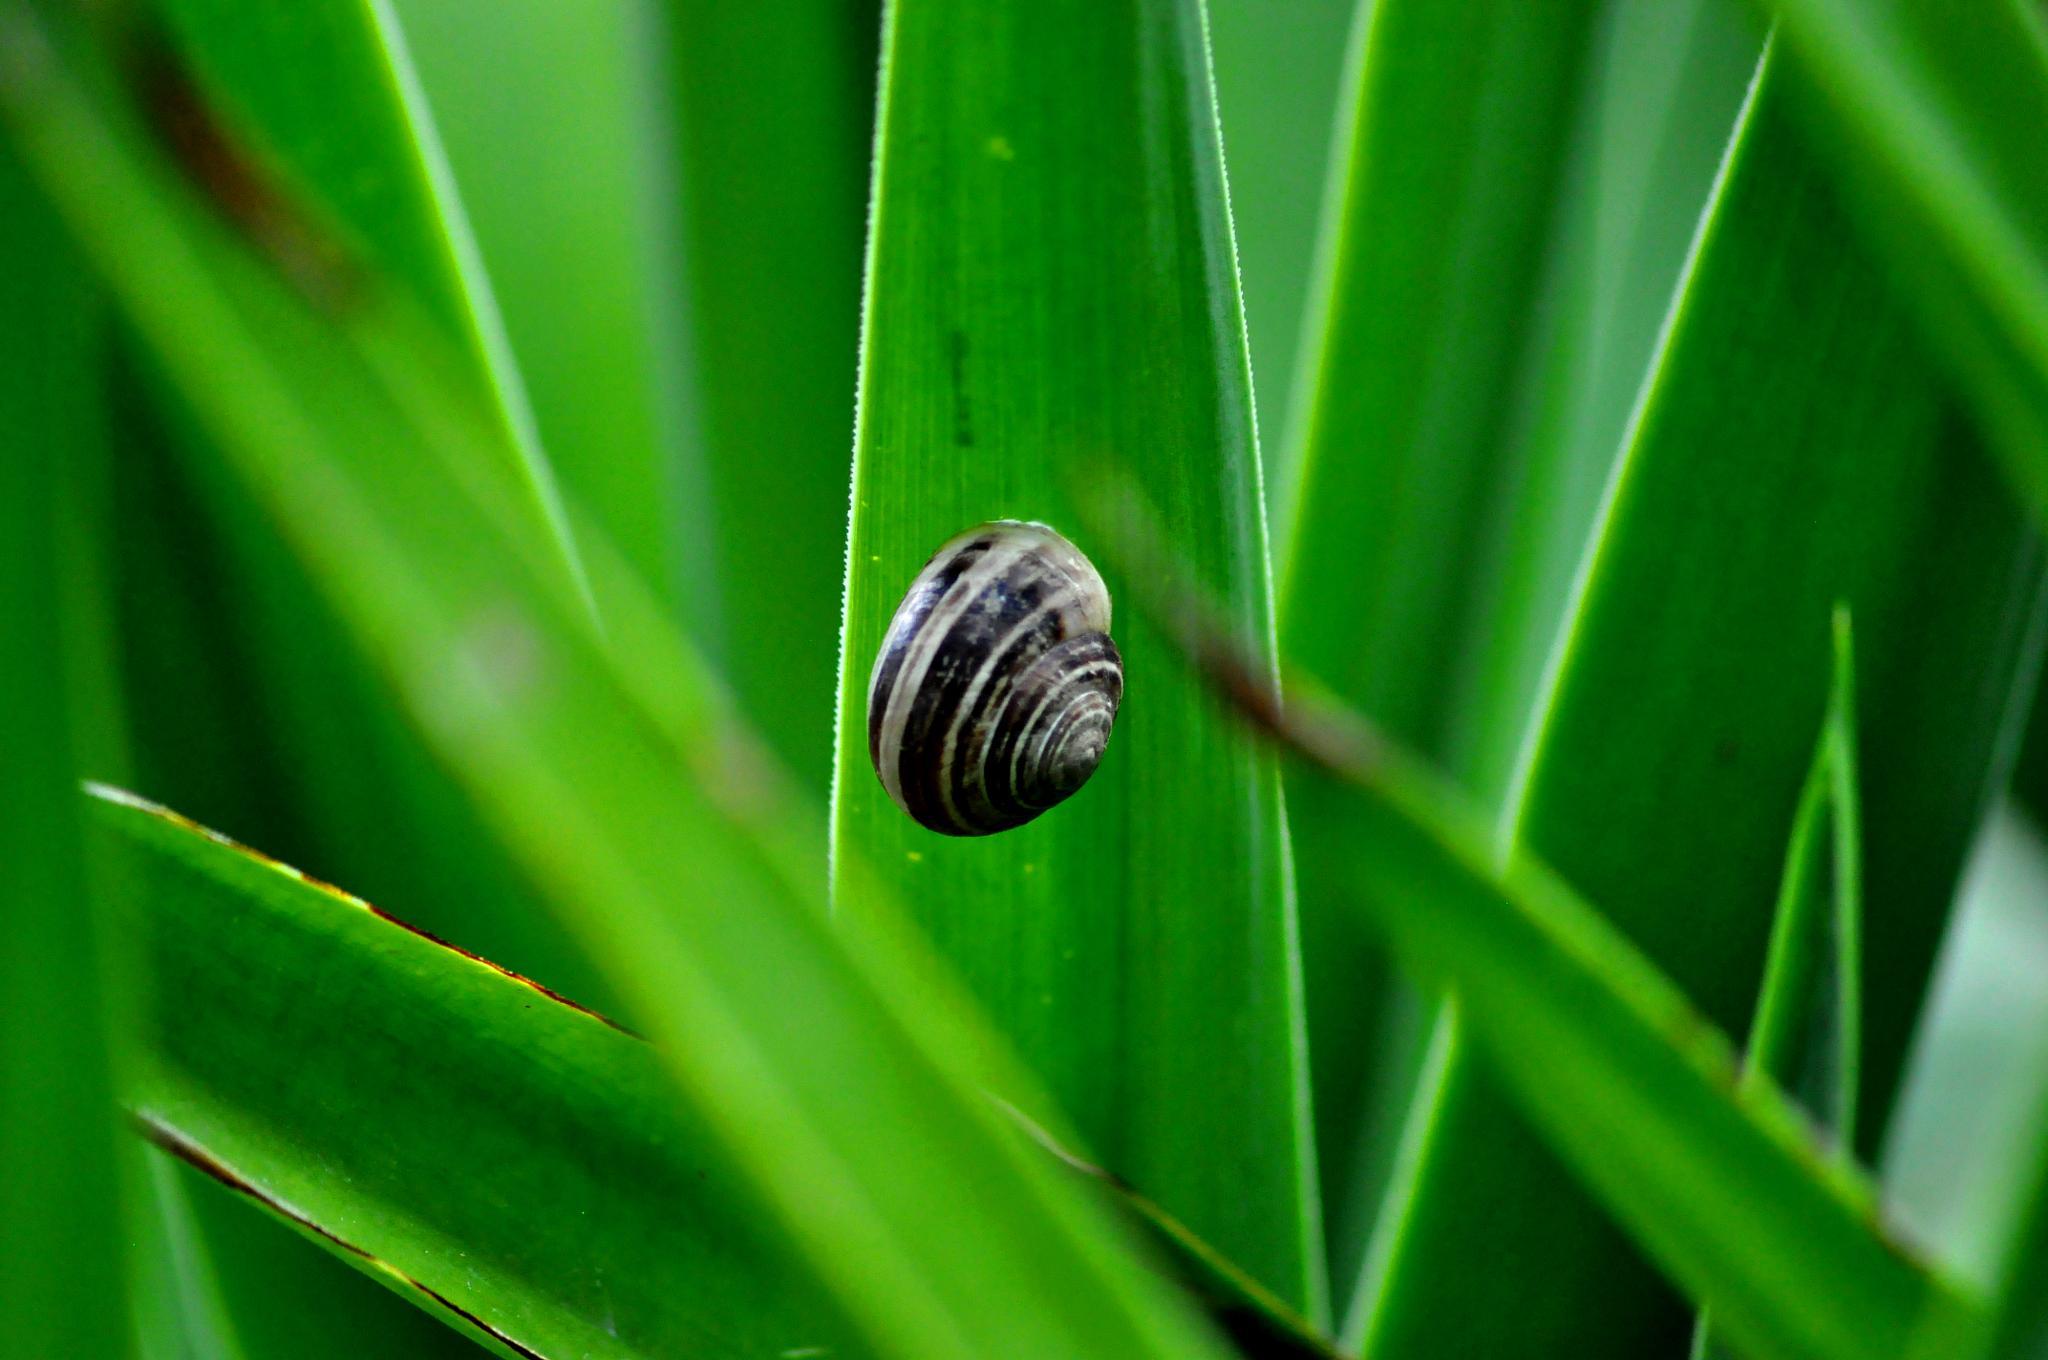 snail by cebaskaya